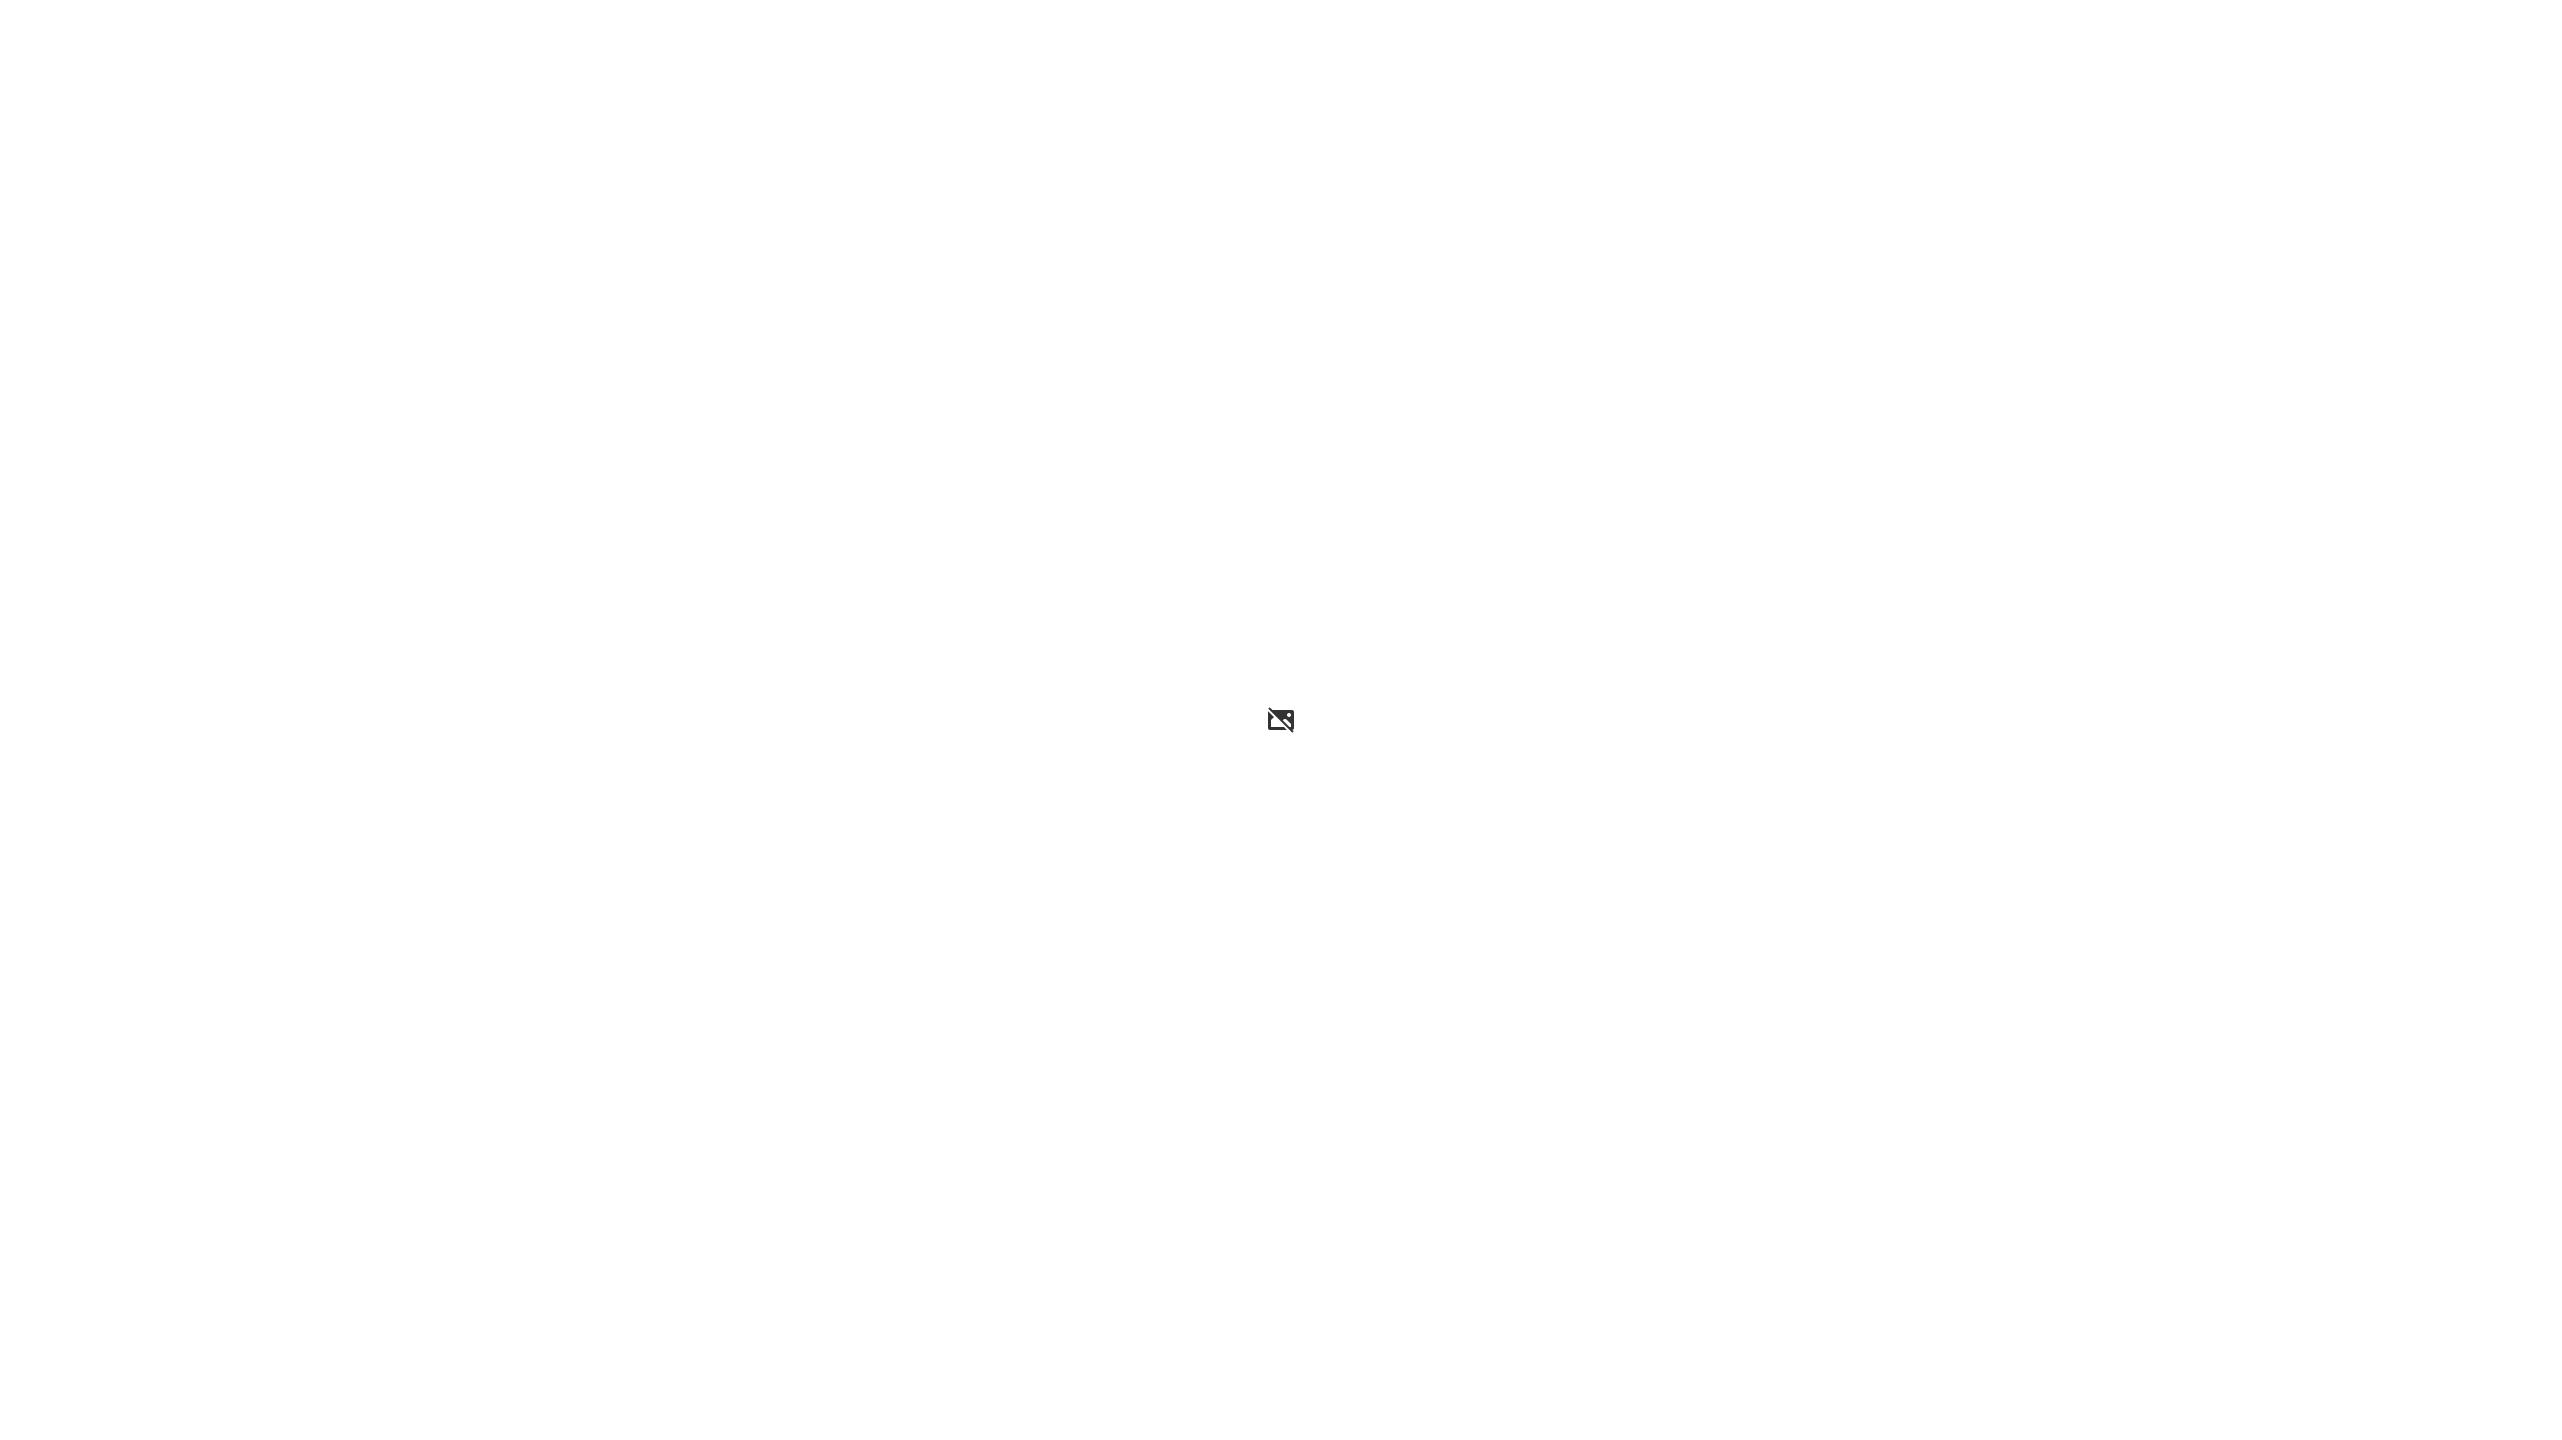 spooky_gangplank_by_marian027-d906g6o